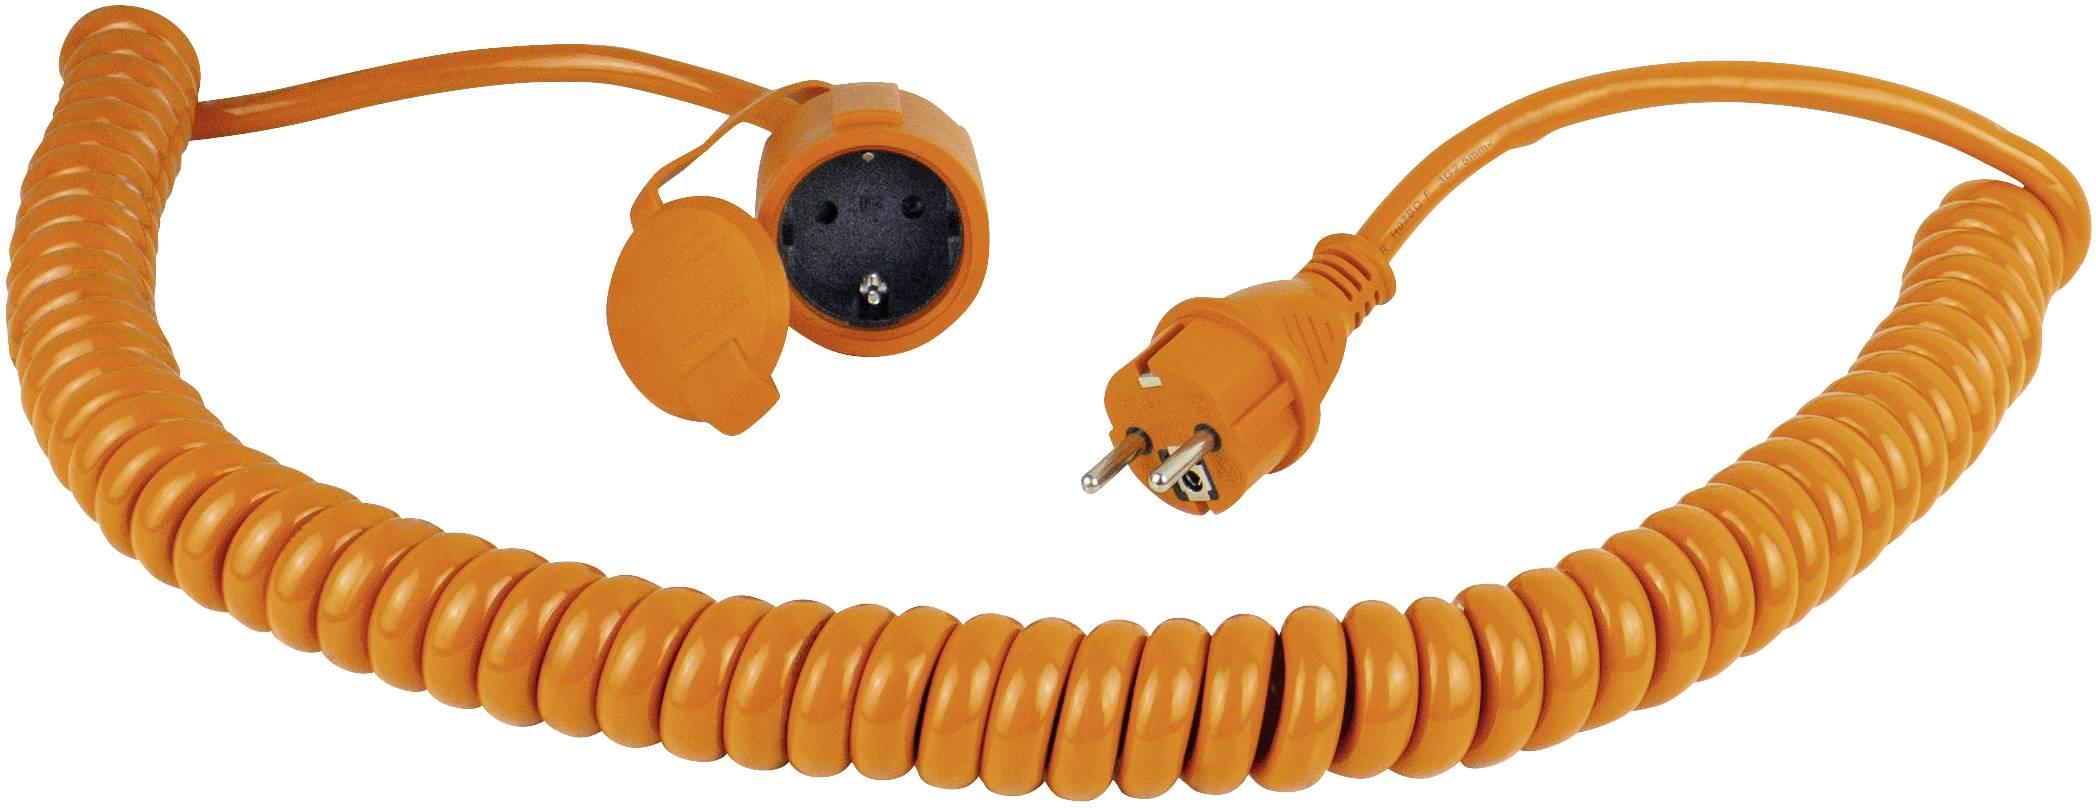 Napájací predlžovací kábel špirálový kábel as - Schwabe 70415, IP44, oranžová, čierna, 5 m